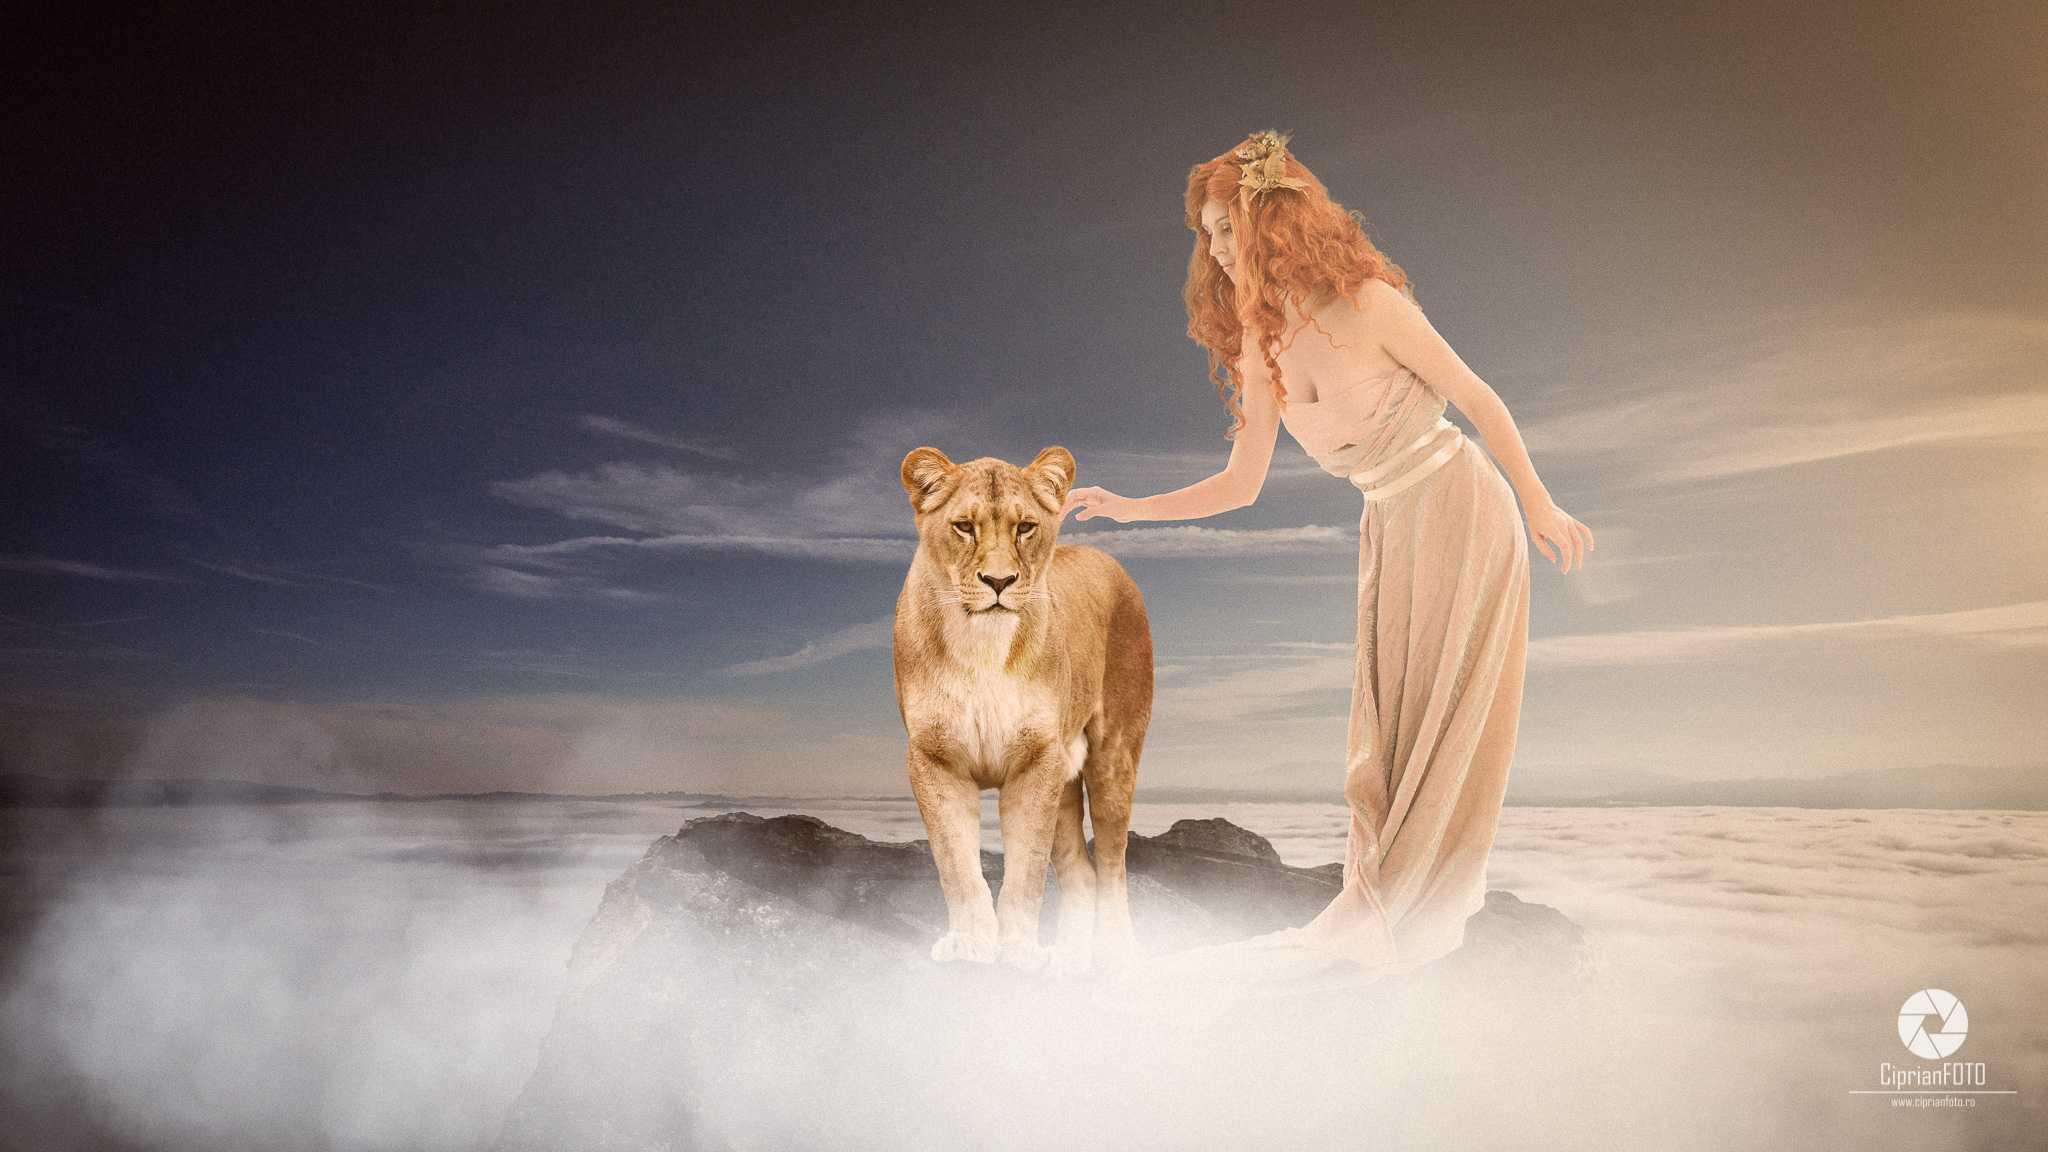 Girl And Lion, Photoshop Manipulation Tutorial, CiprianFOTO